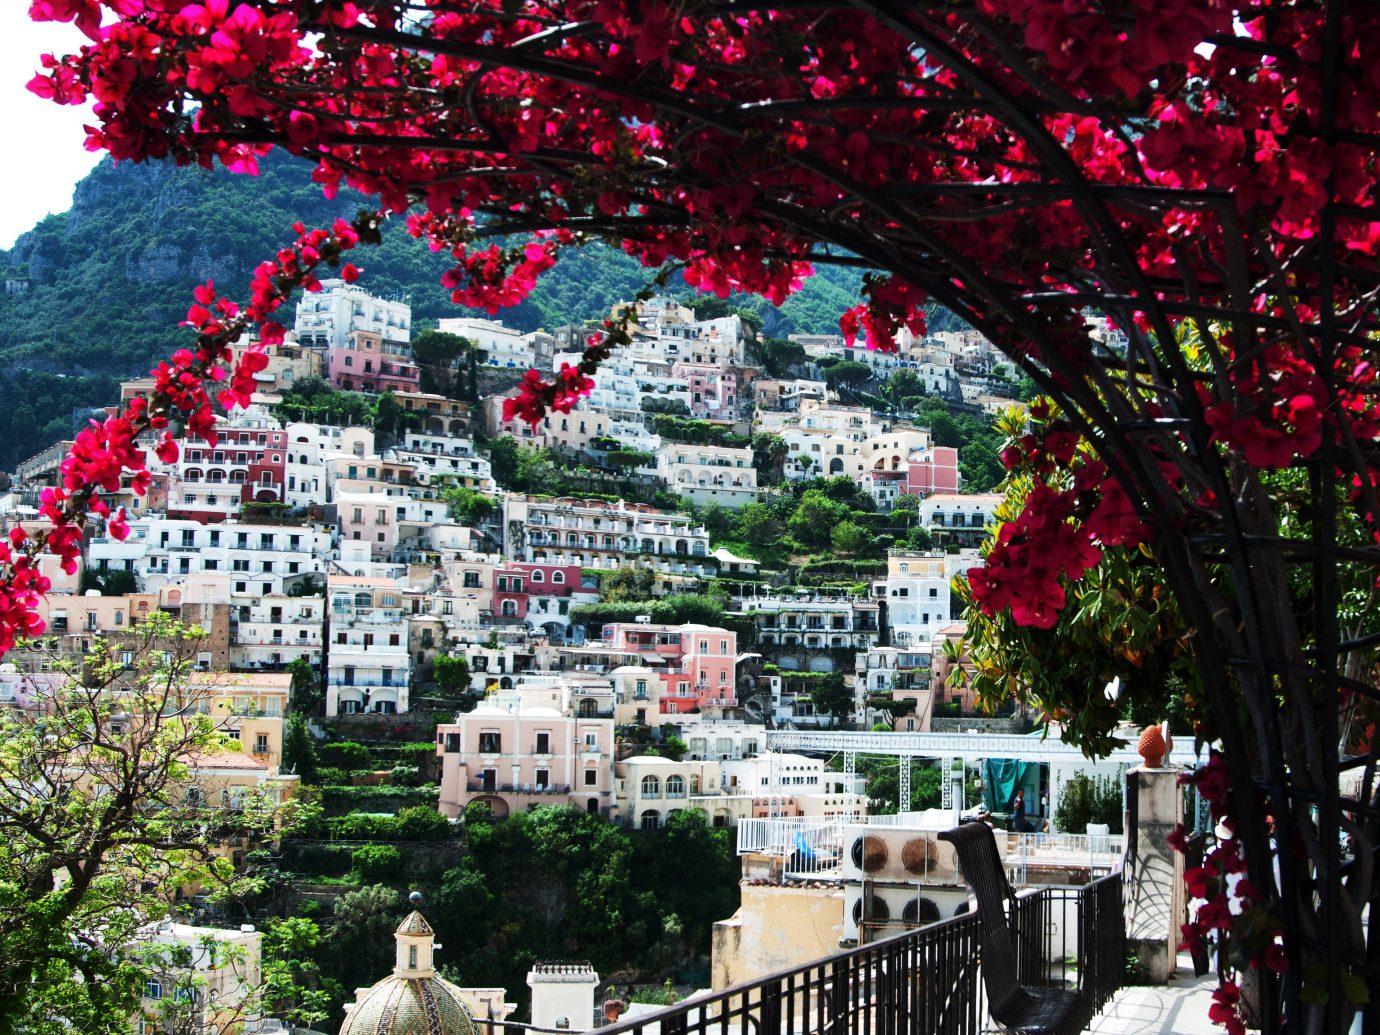 View of Amalfi from Hotel Santa Caterina